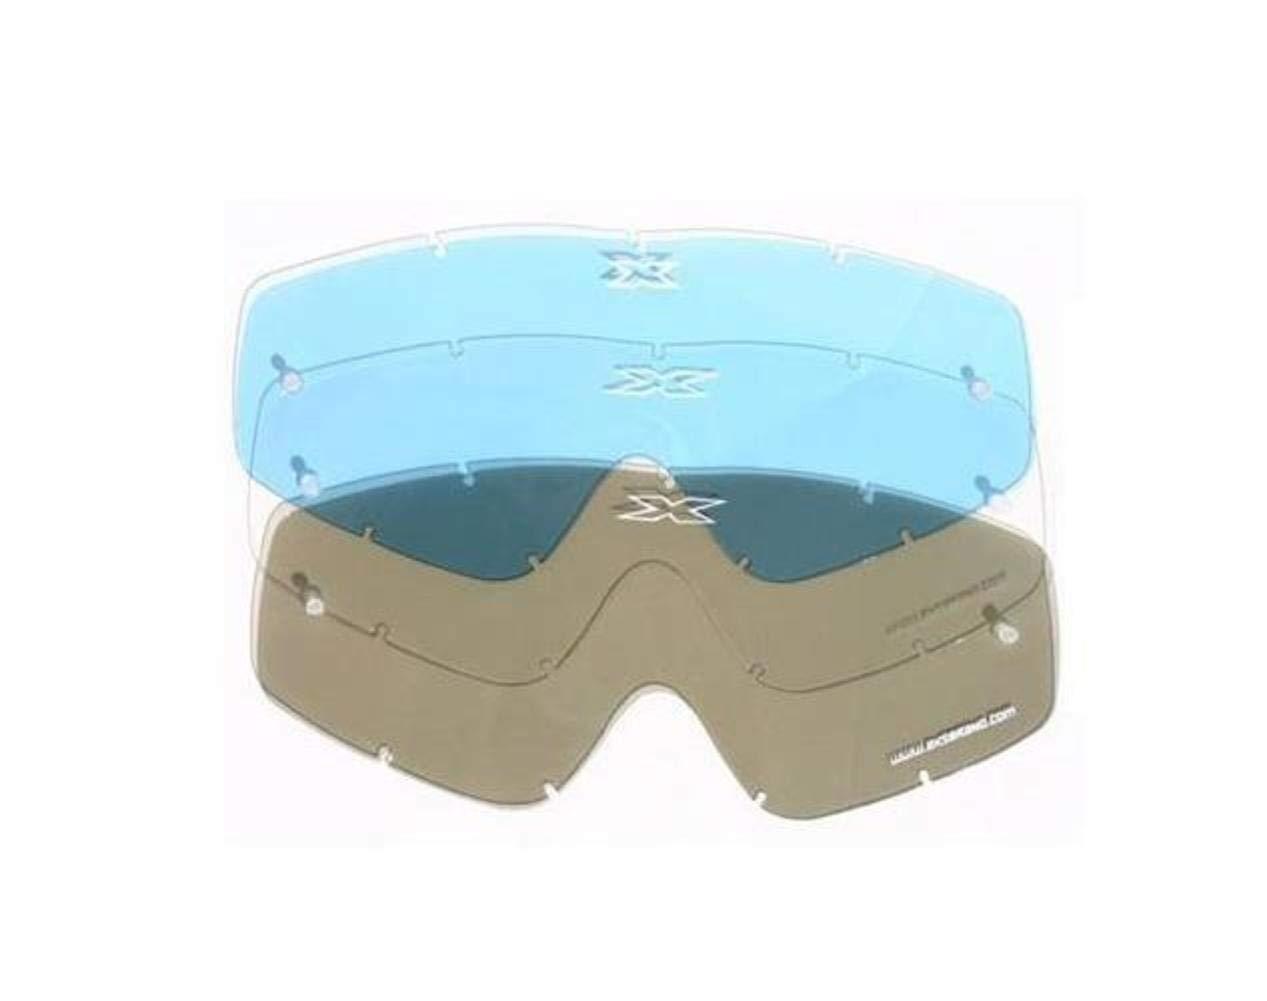 EKS BRAND Unisex-Adult X-GROM MX Motorcross Goggle Replacement Lens Smoke, One Size